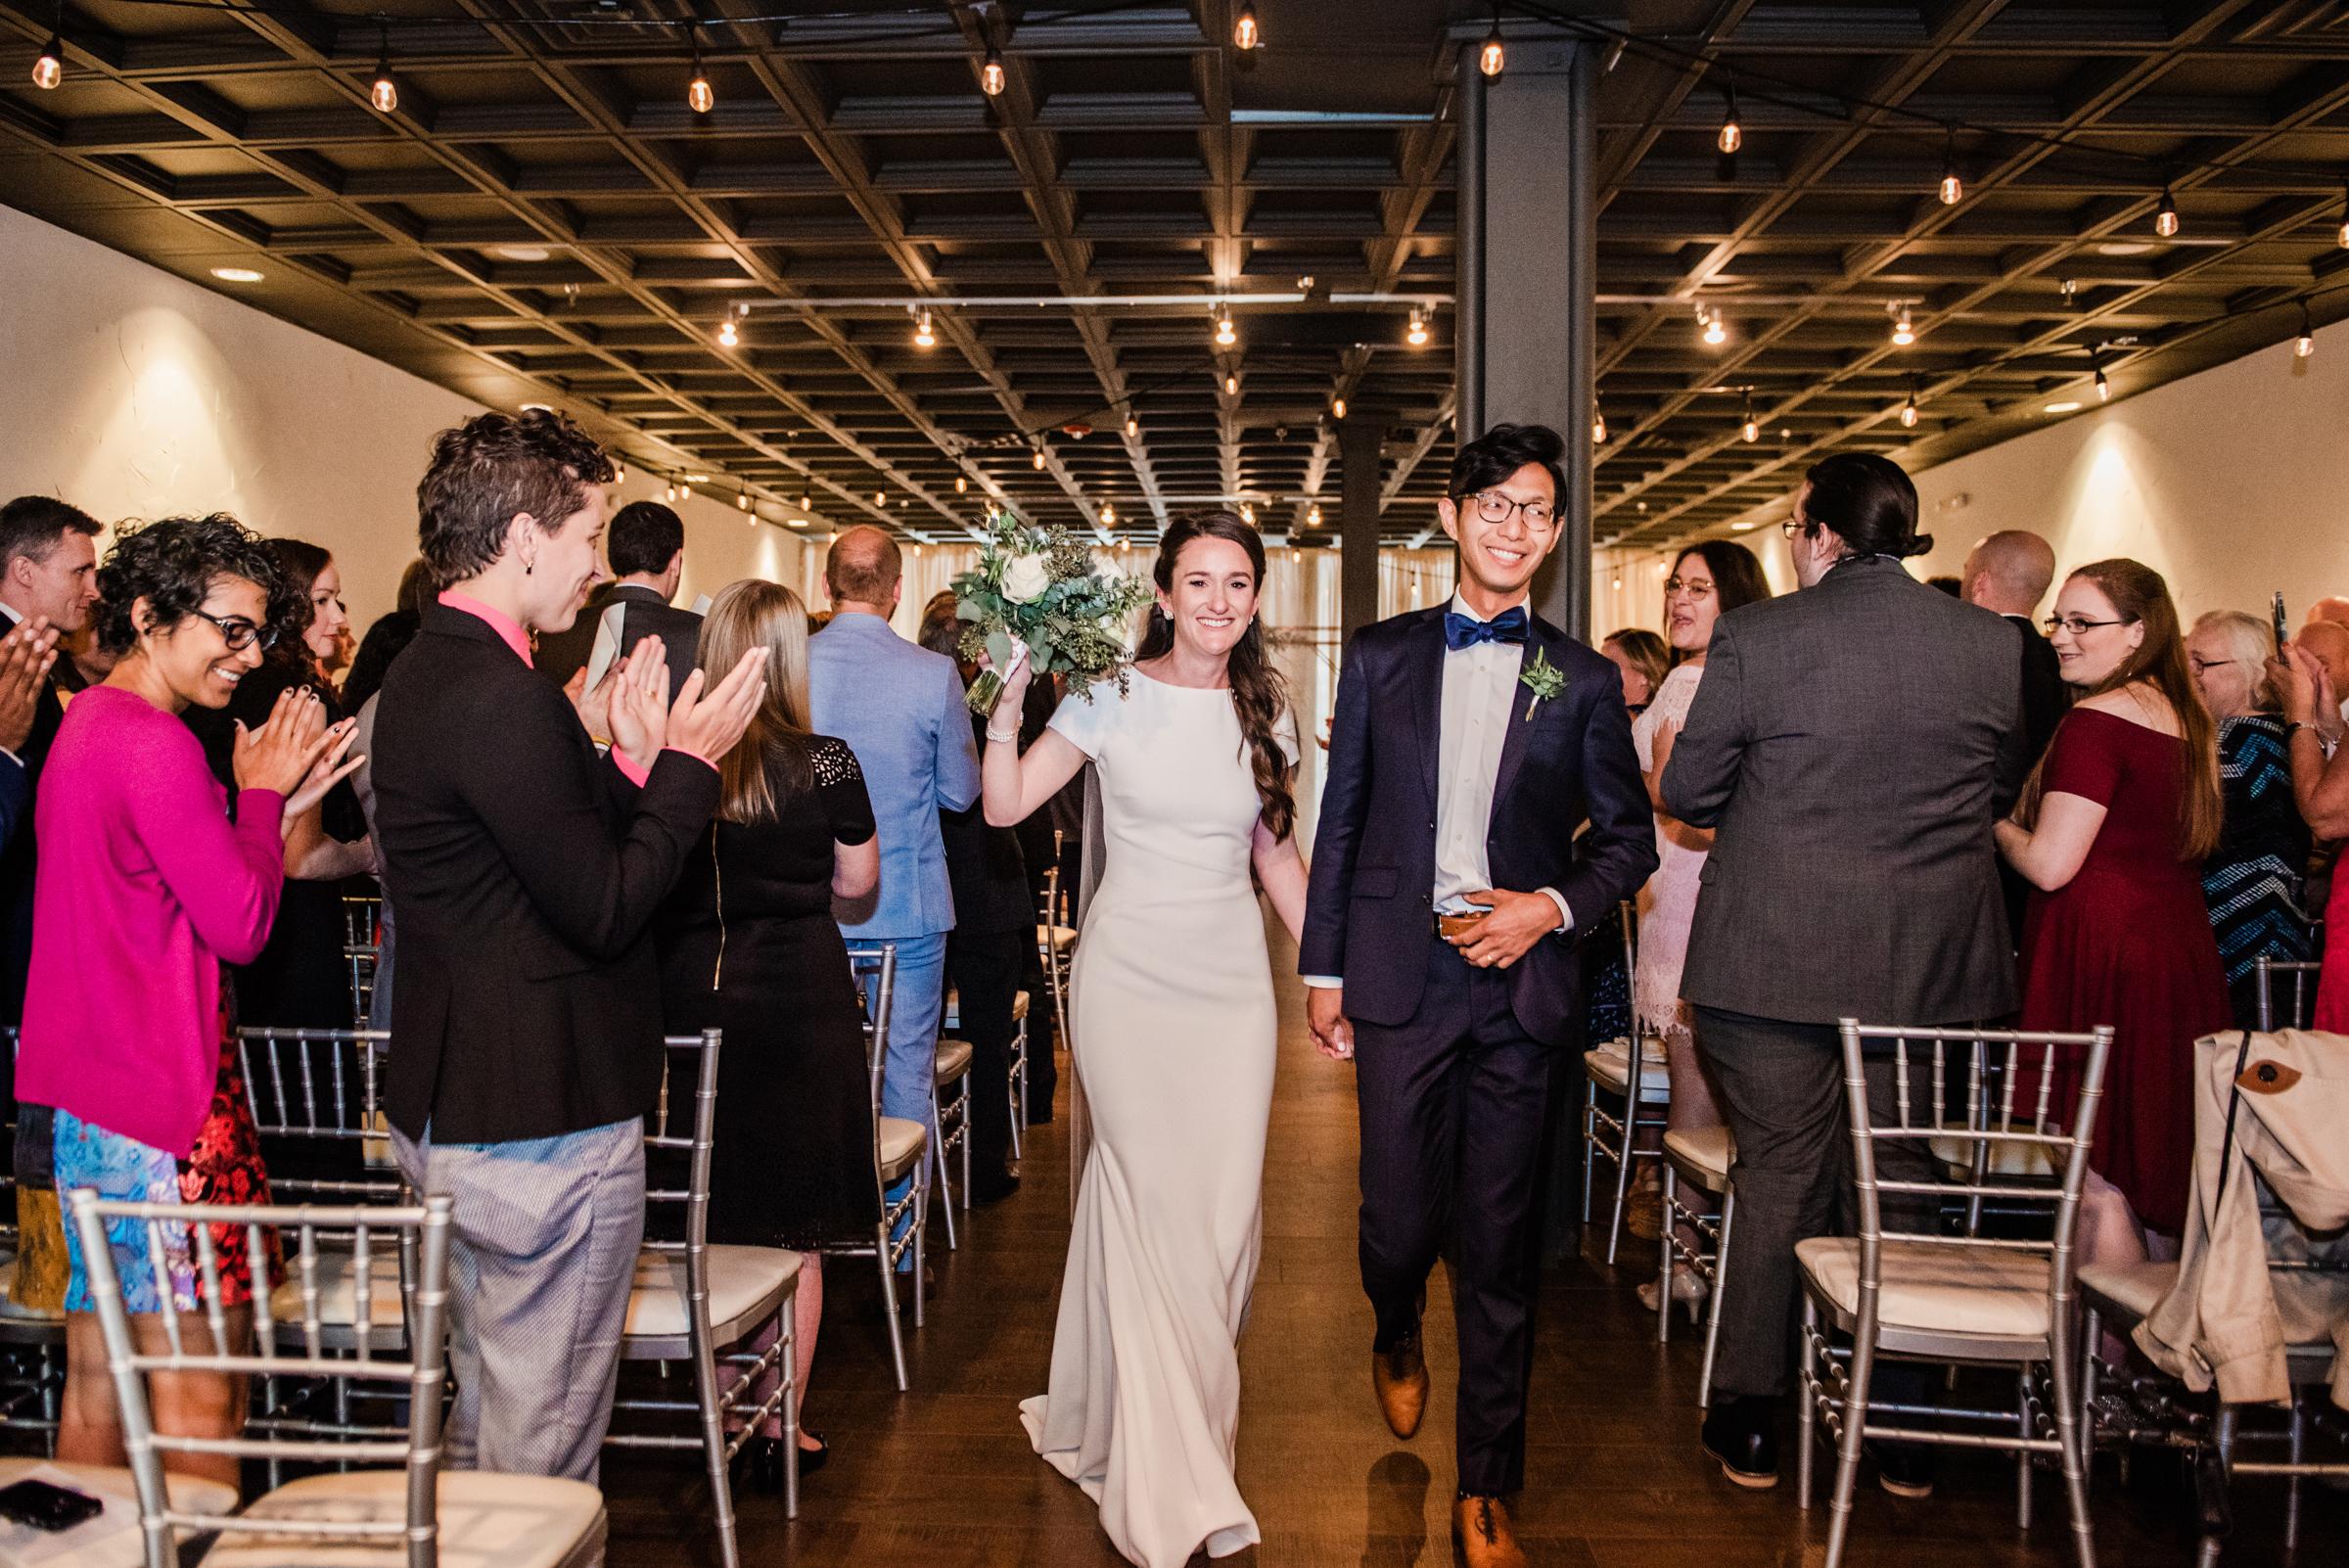 SKY_Armory_Syracuse_Wedding_JILL_STUDIO_Rochester_NY_Photographer_DSC_5951.jpg